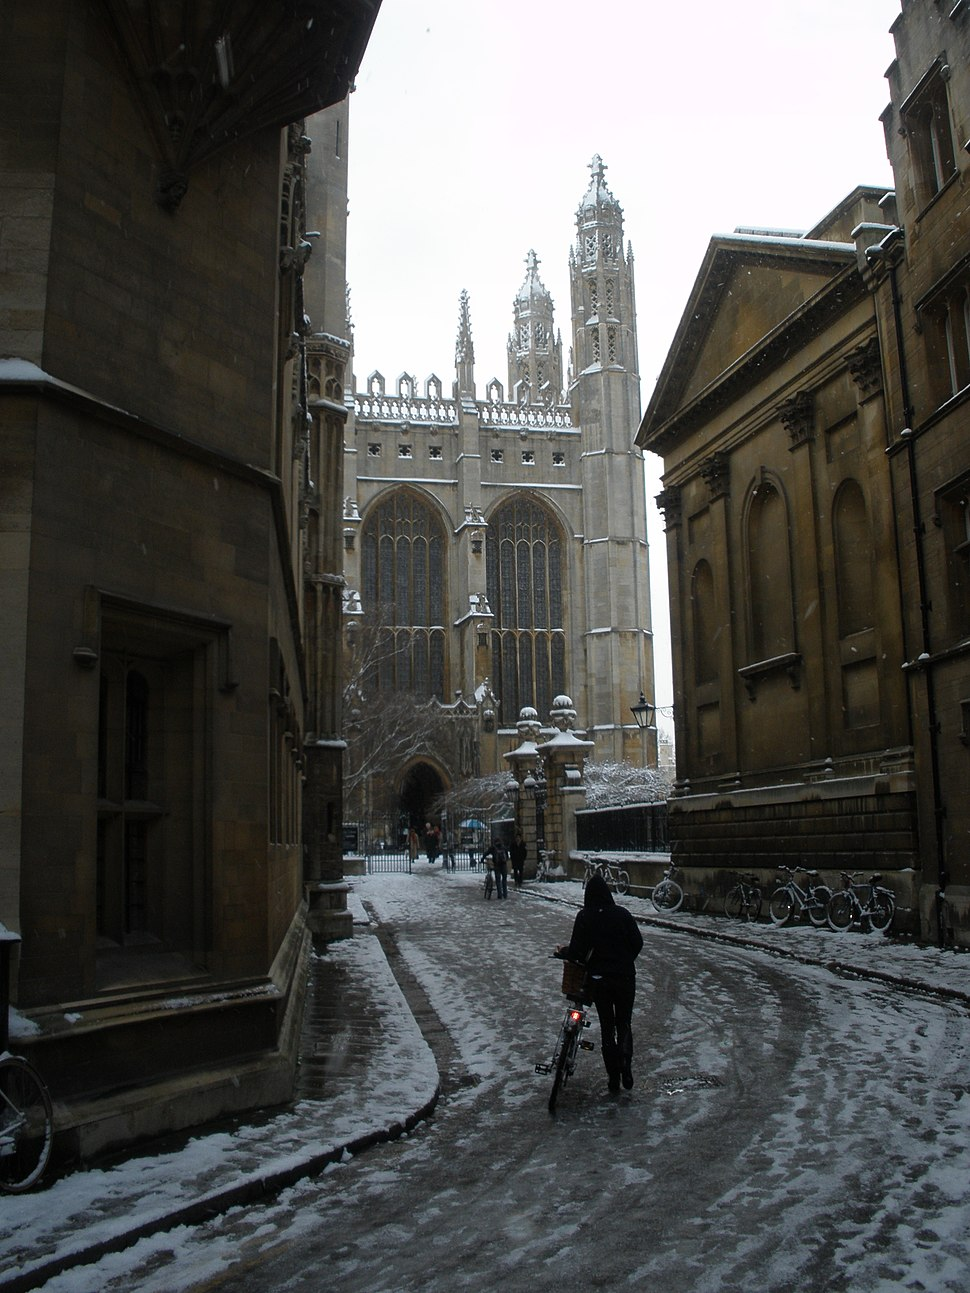 Kings Chapel from Trinity Lane in snow